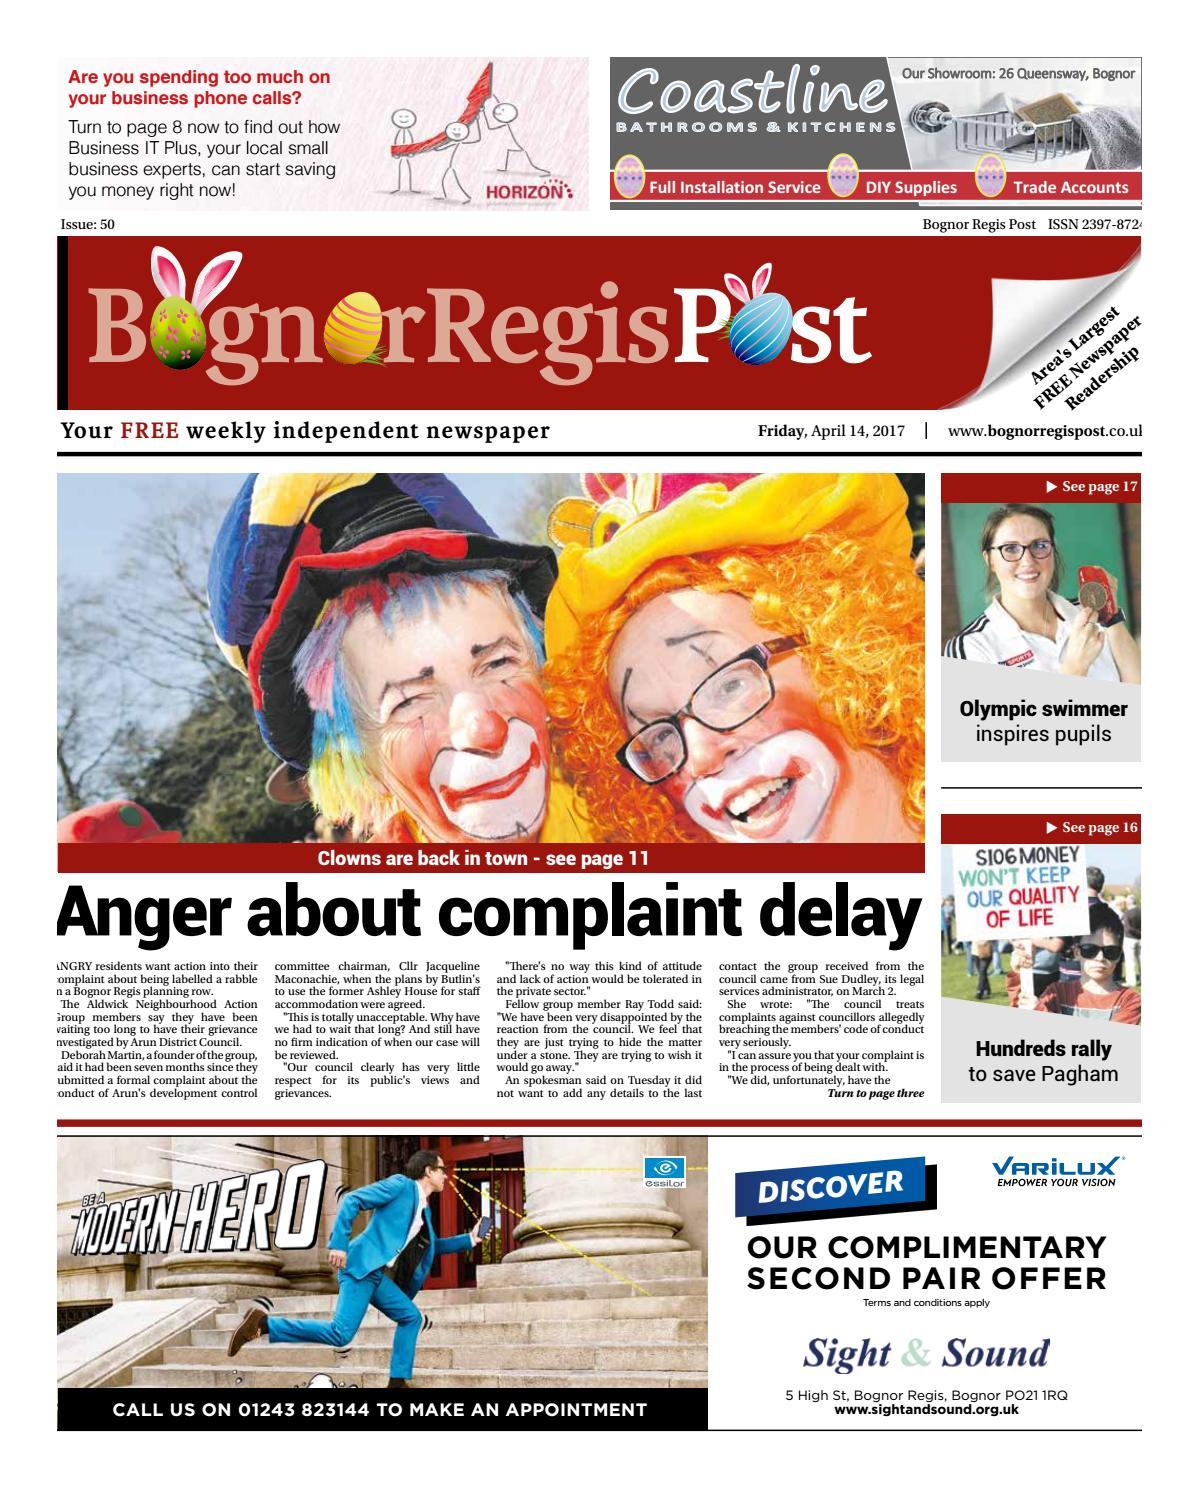 Bognor Regis Post Issue 50 By Newspapers